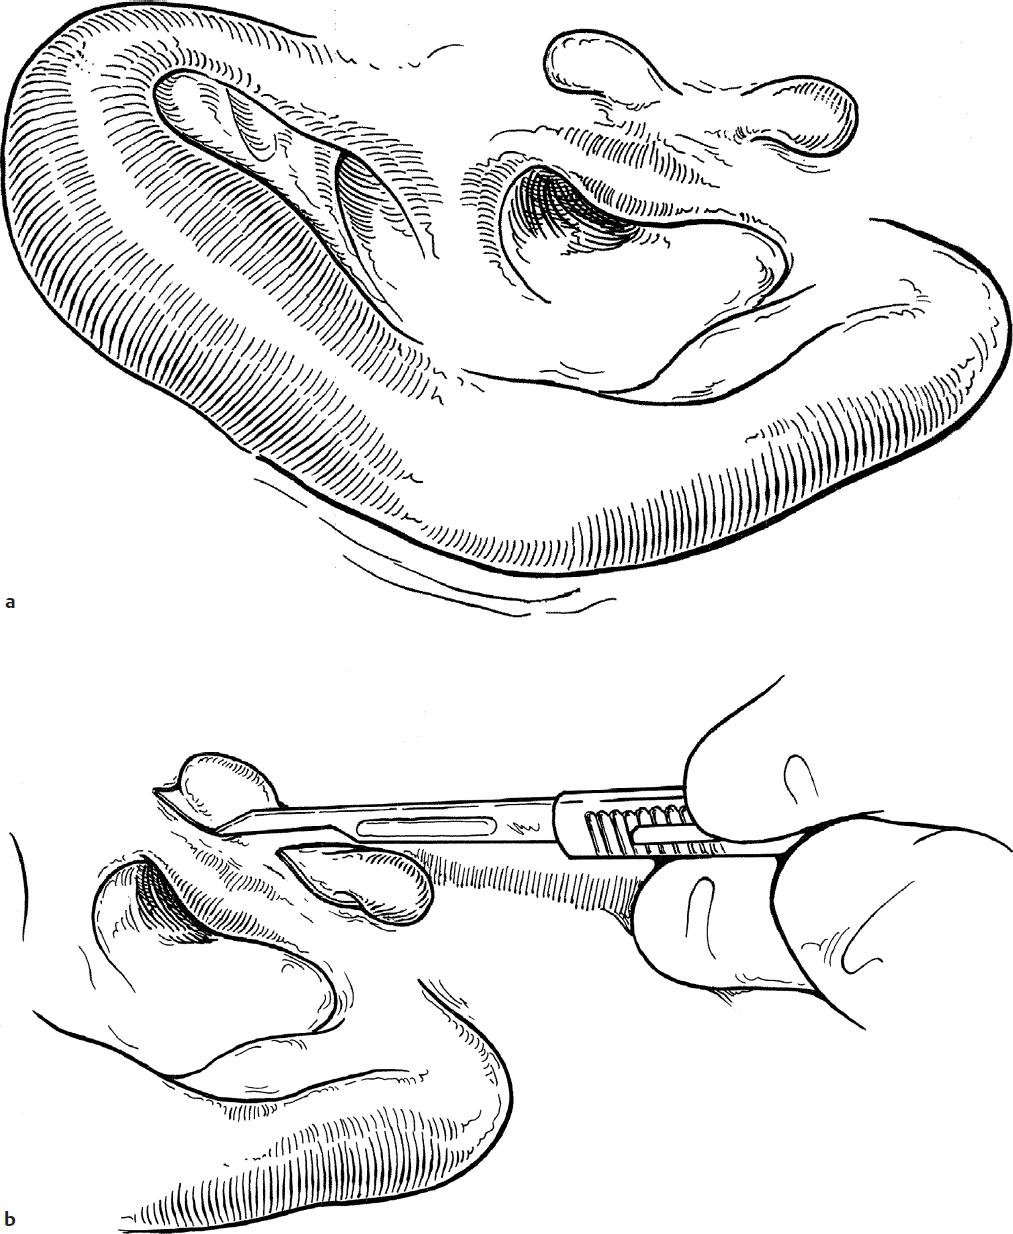 Congenital Malformations of the Ear | Ento Key